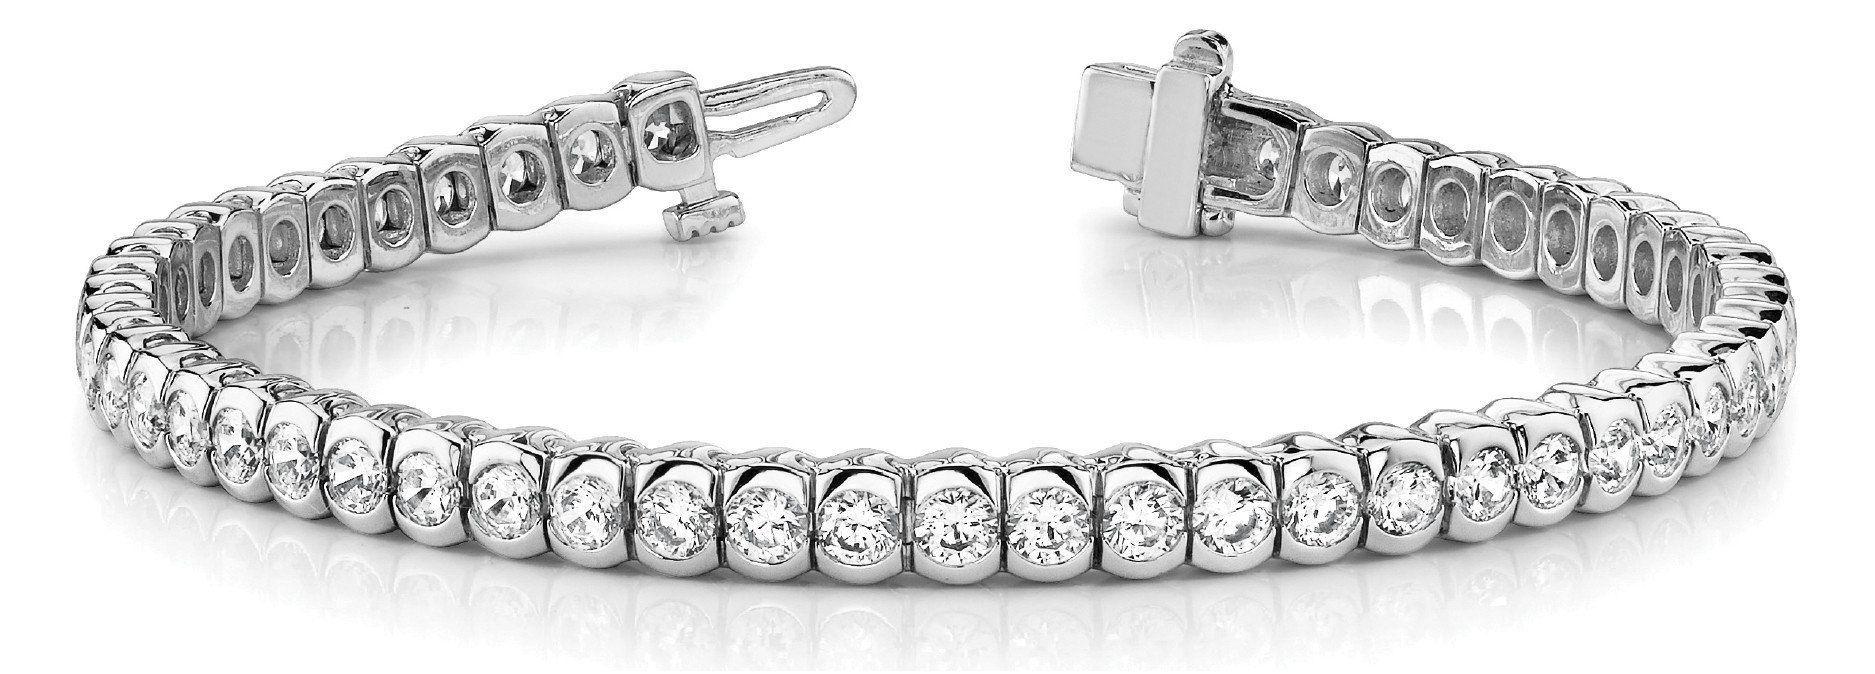 3 7 8 Ct Diamond Bracelet With F Color Vs Clarity Diamonds